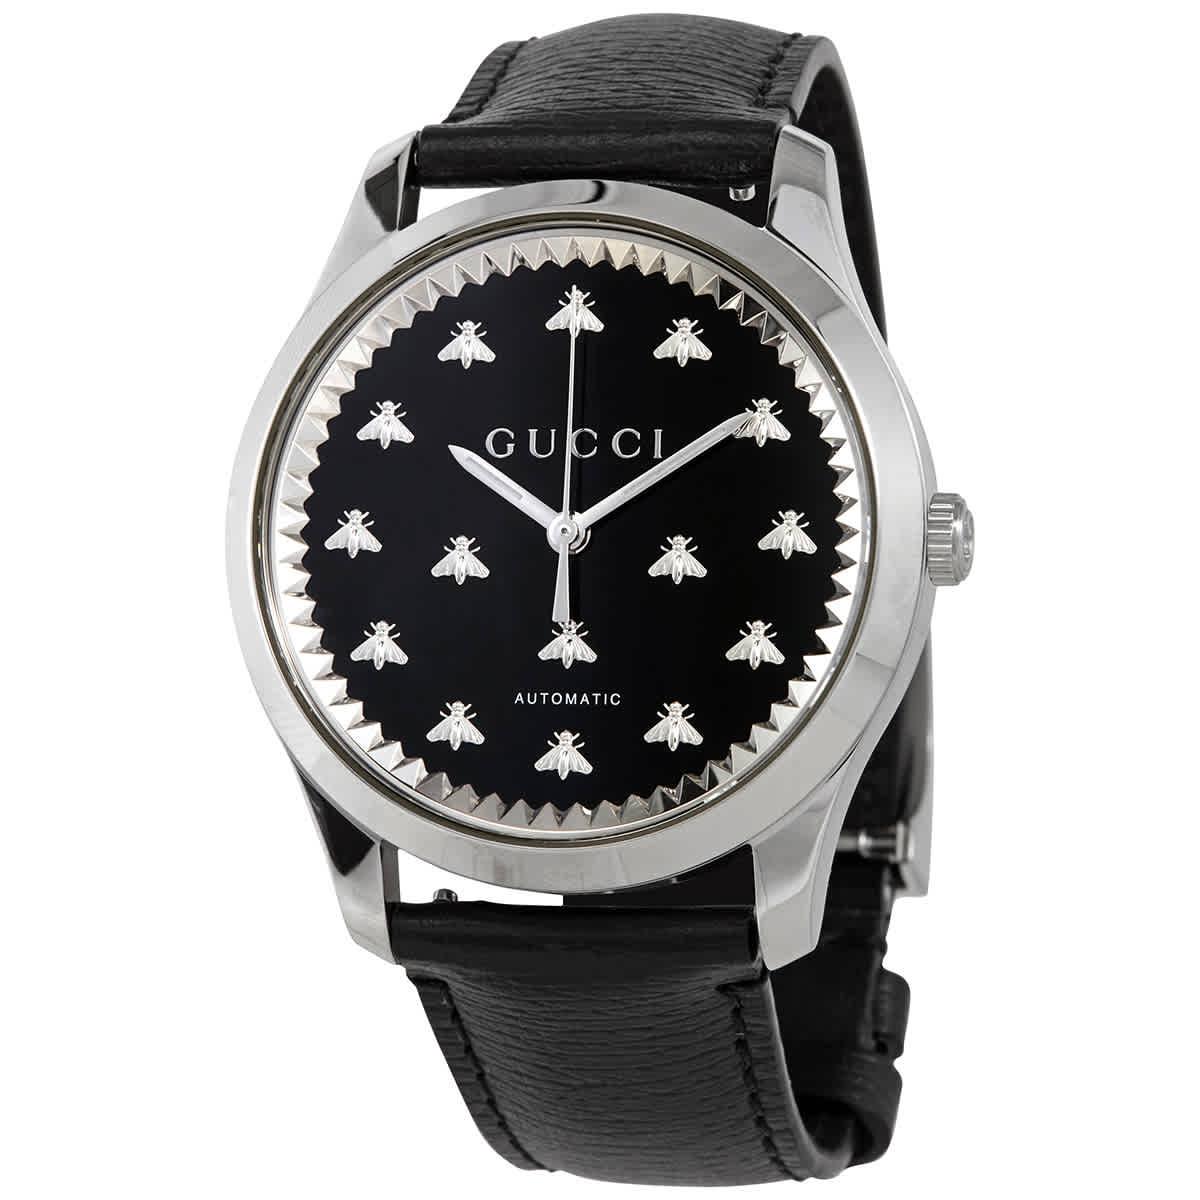 Gucci G-timeless Automatic Black Onyx Stone Dial Mens Watch Ya126286 In Metallic